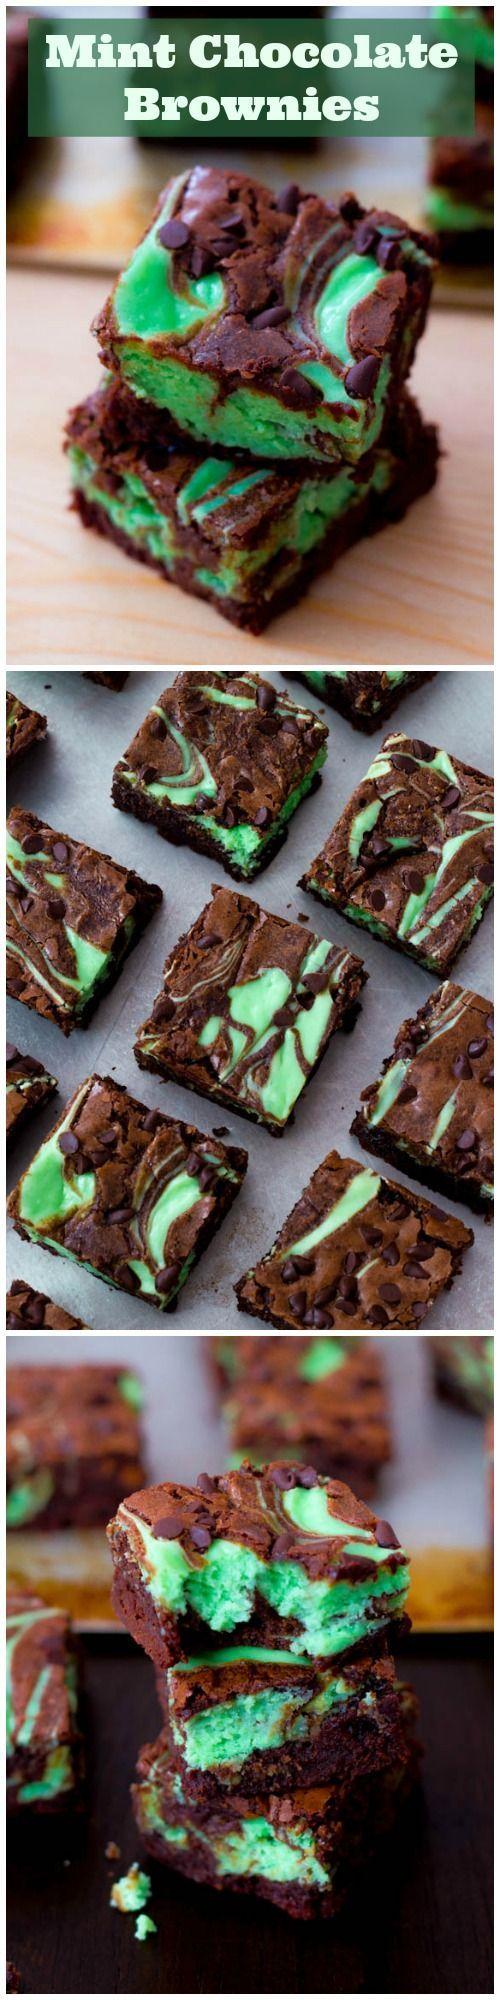 Swirly, twirly, fudgy, minty, cheesecake goodness. I love these decadent mint chocolate brownies!